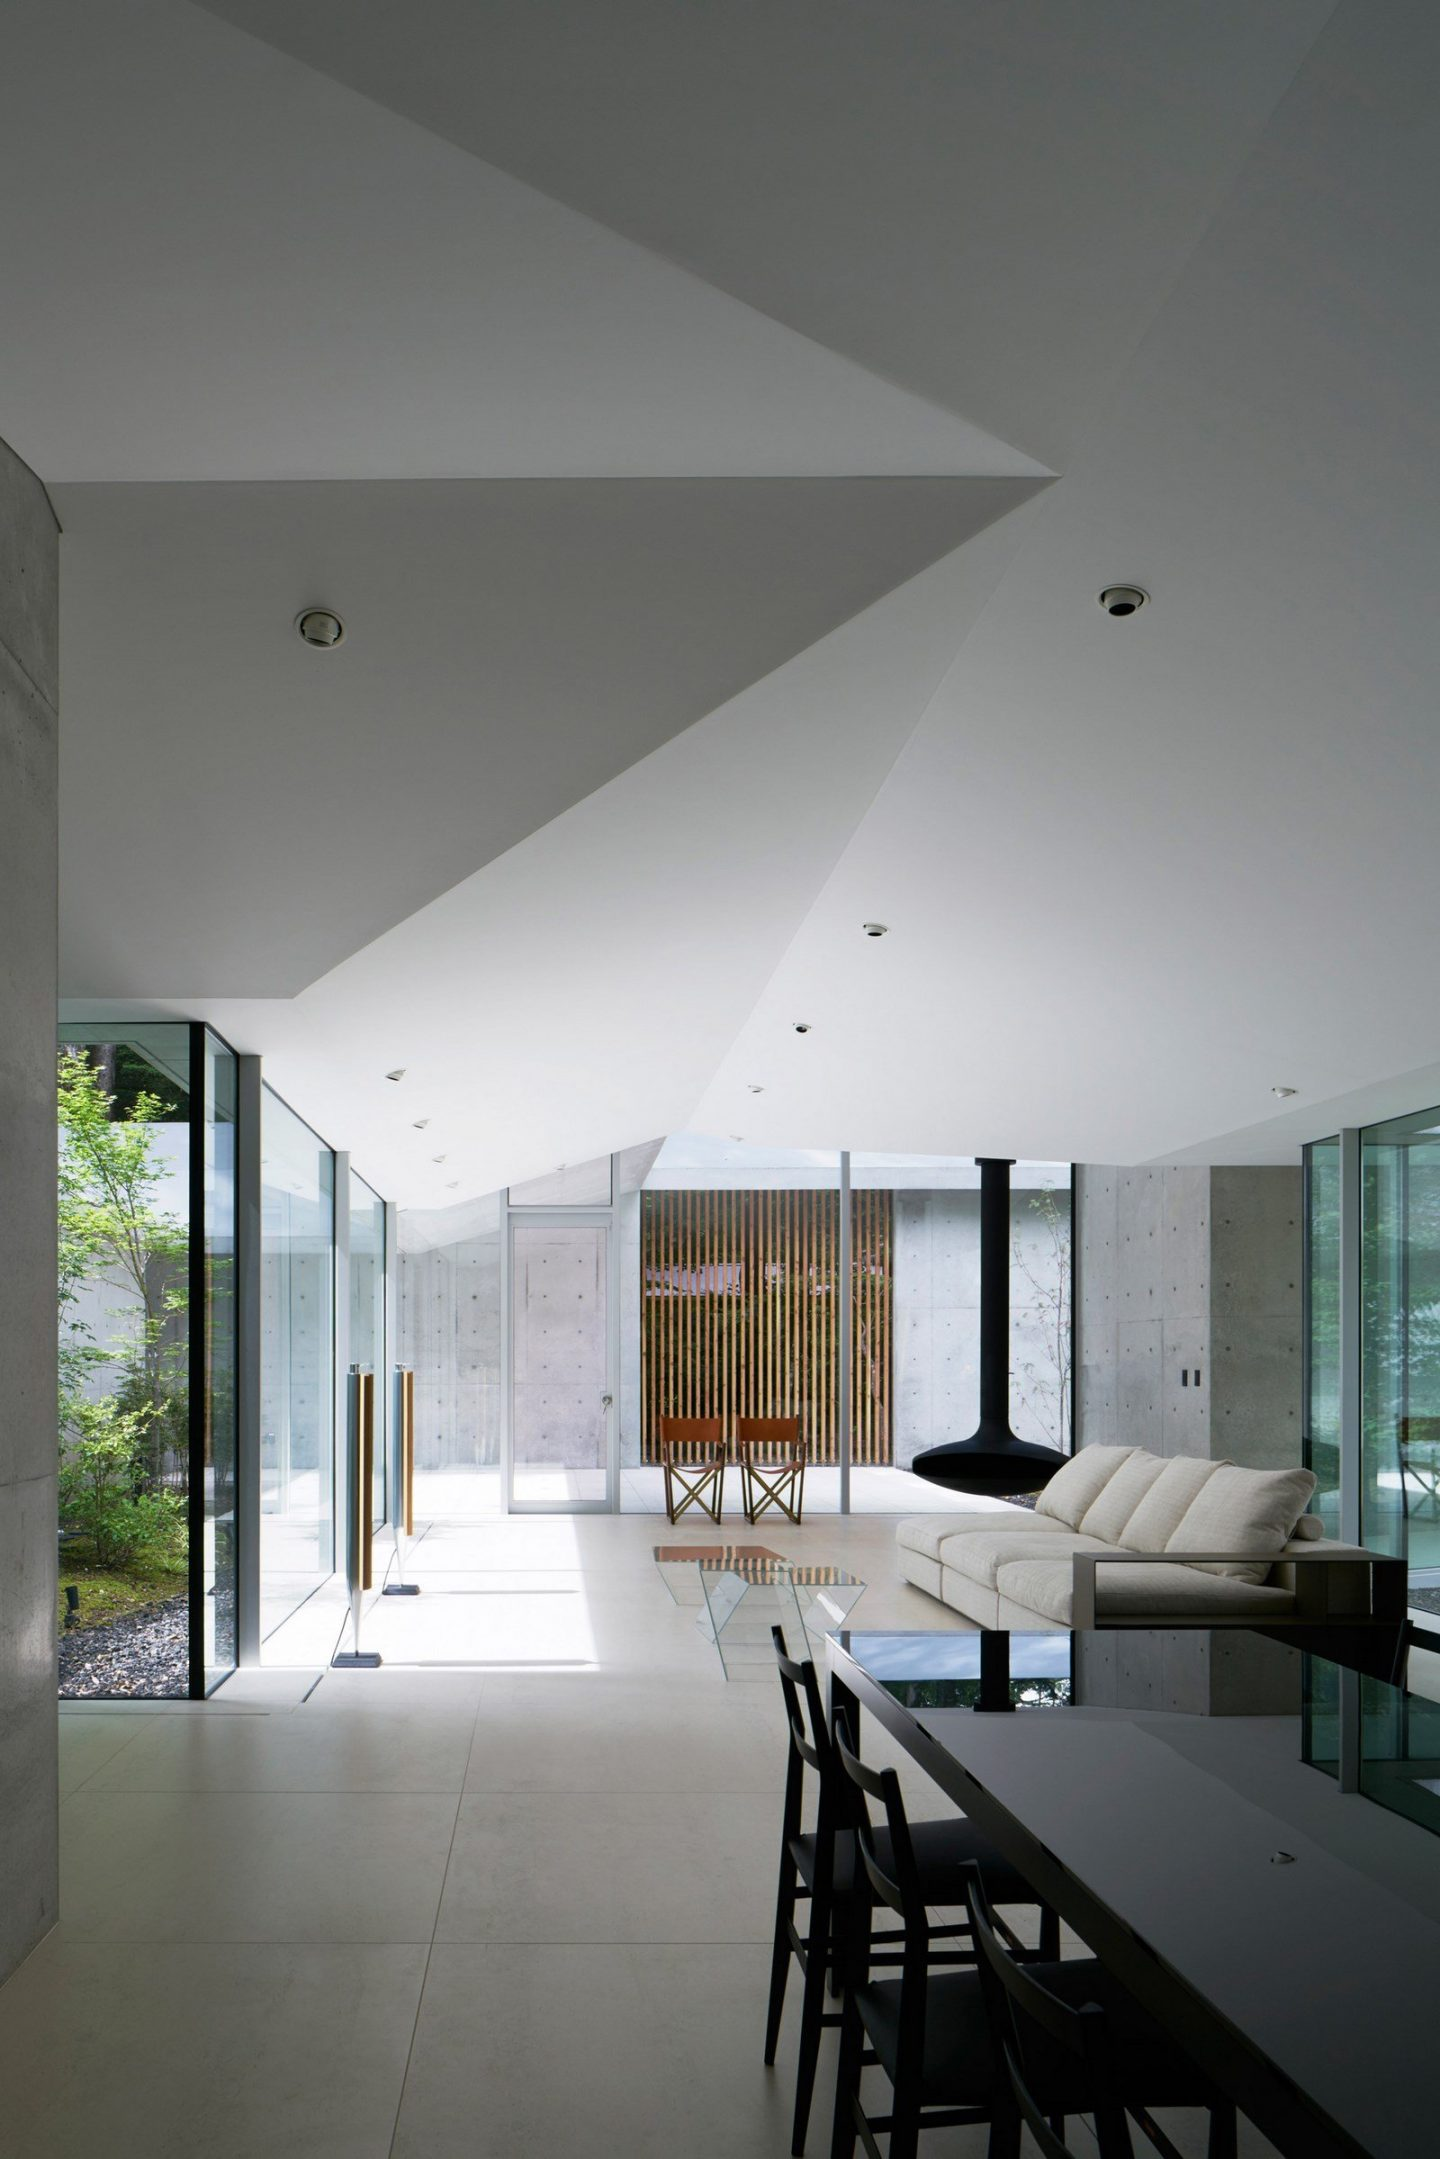 Matsubara_Ariyama_Architecture (9)